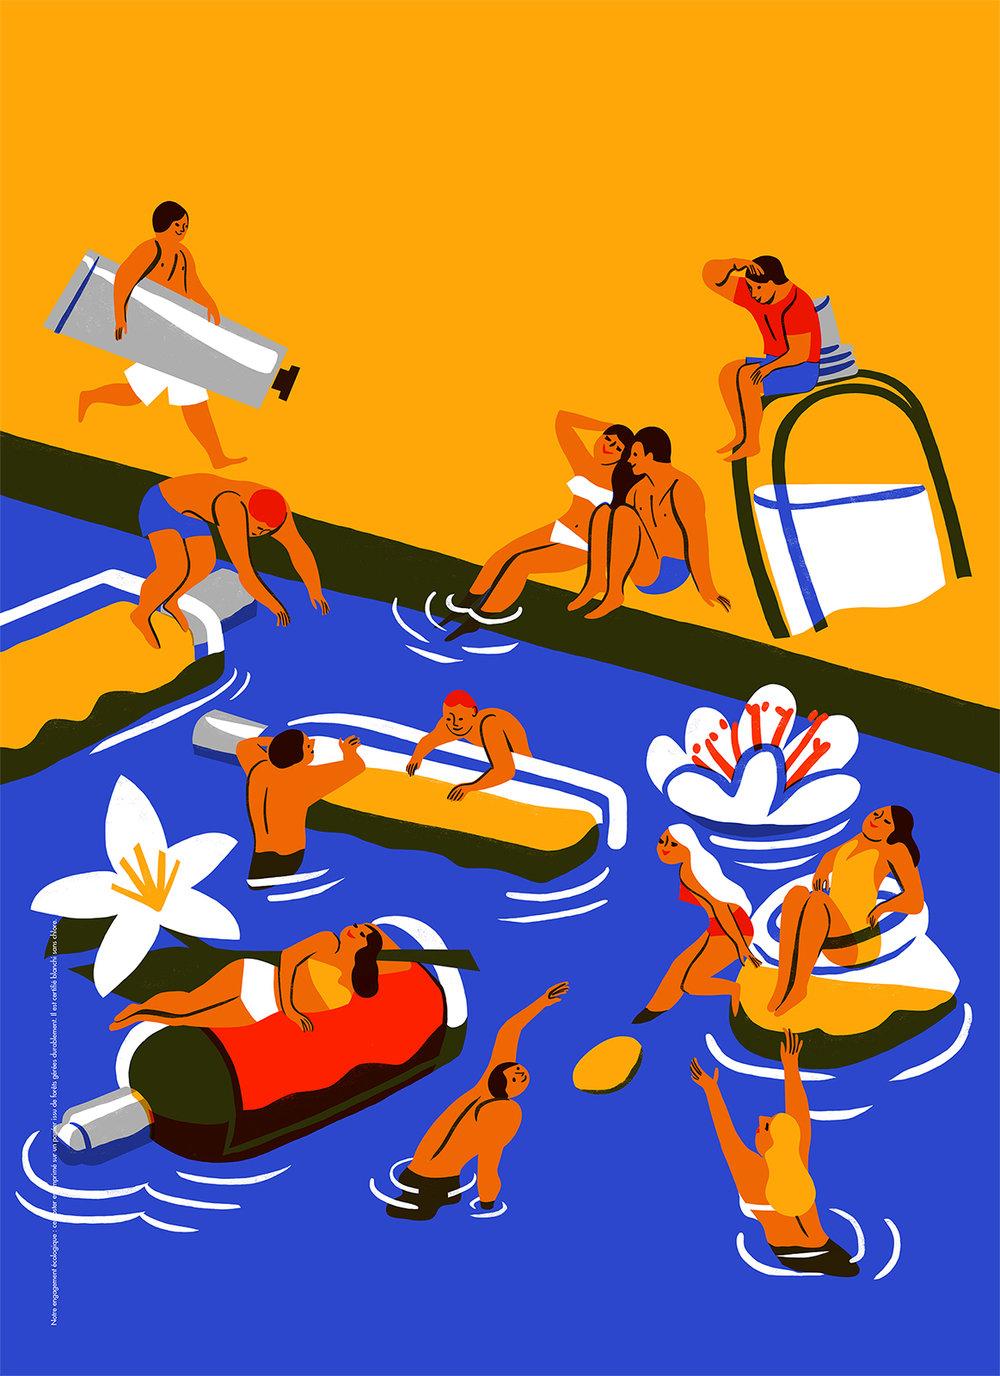 Virginie Morgand | L'Occitane Summer 2016 poster